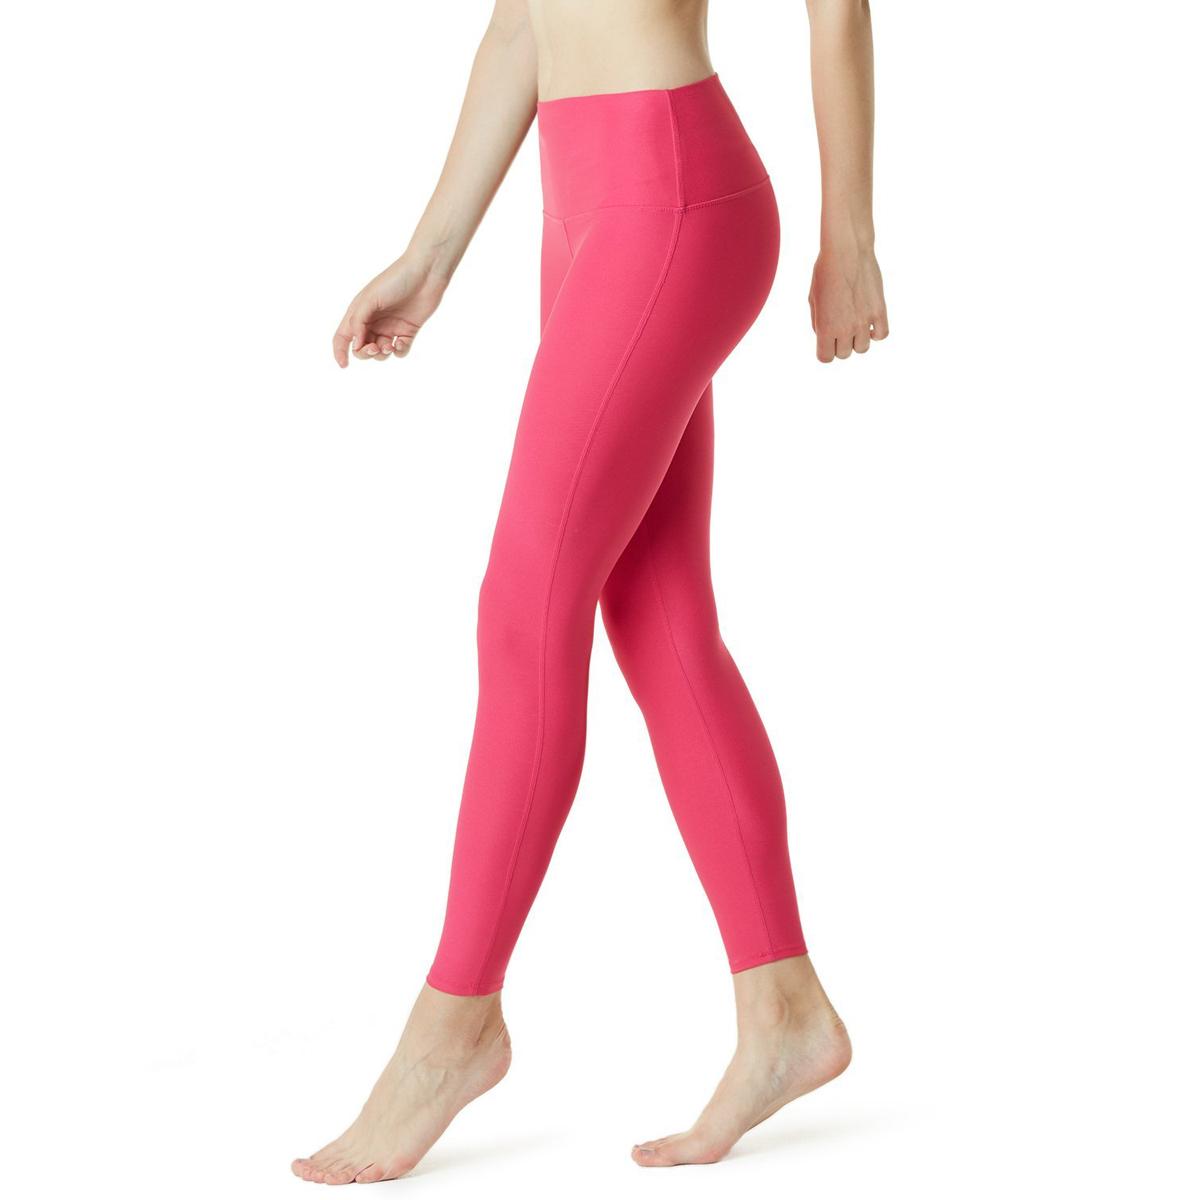 thumbnail 41 - TSLA Tesla FYP42 Women's High-Waisted Ultra-Stretch Tummy Control Yoga Pants